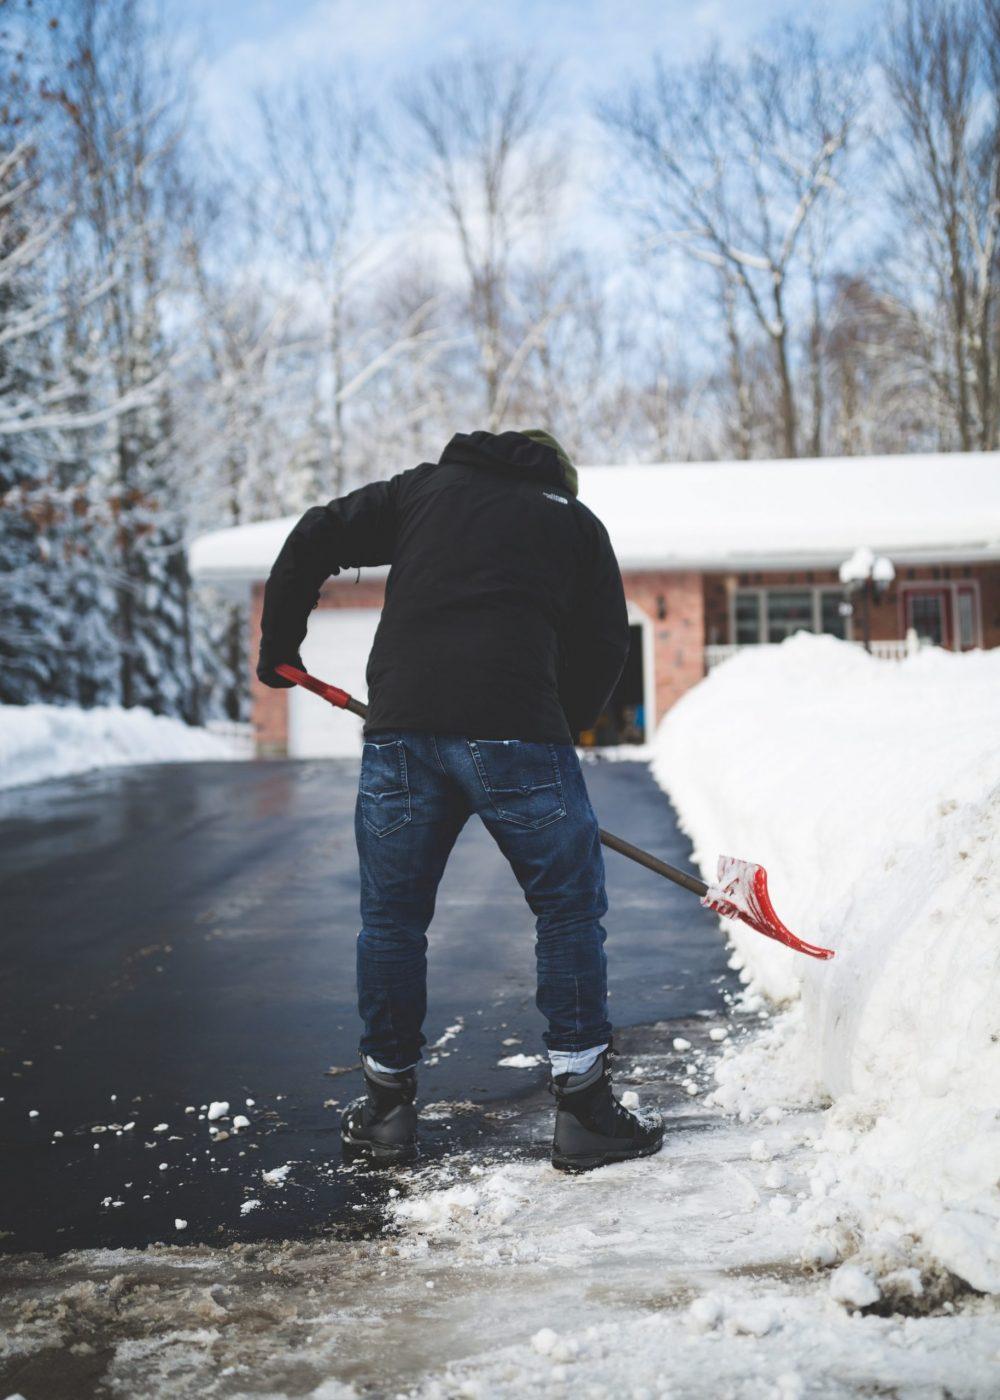 A man shovelling snow on a driveway